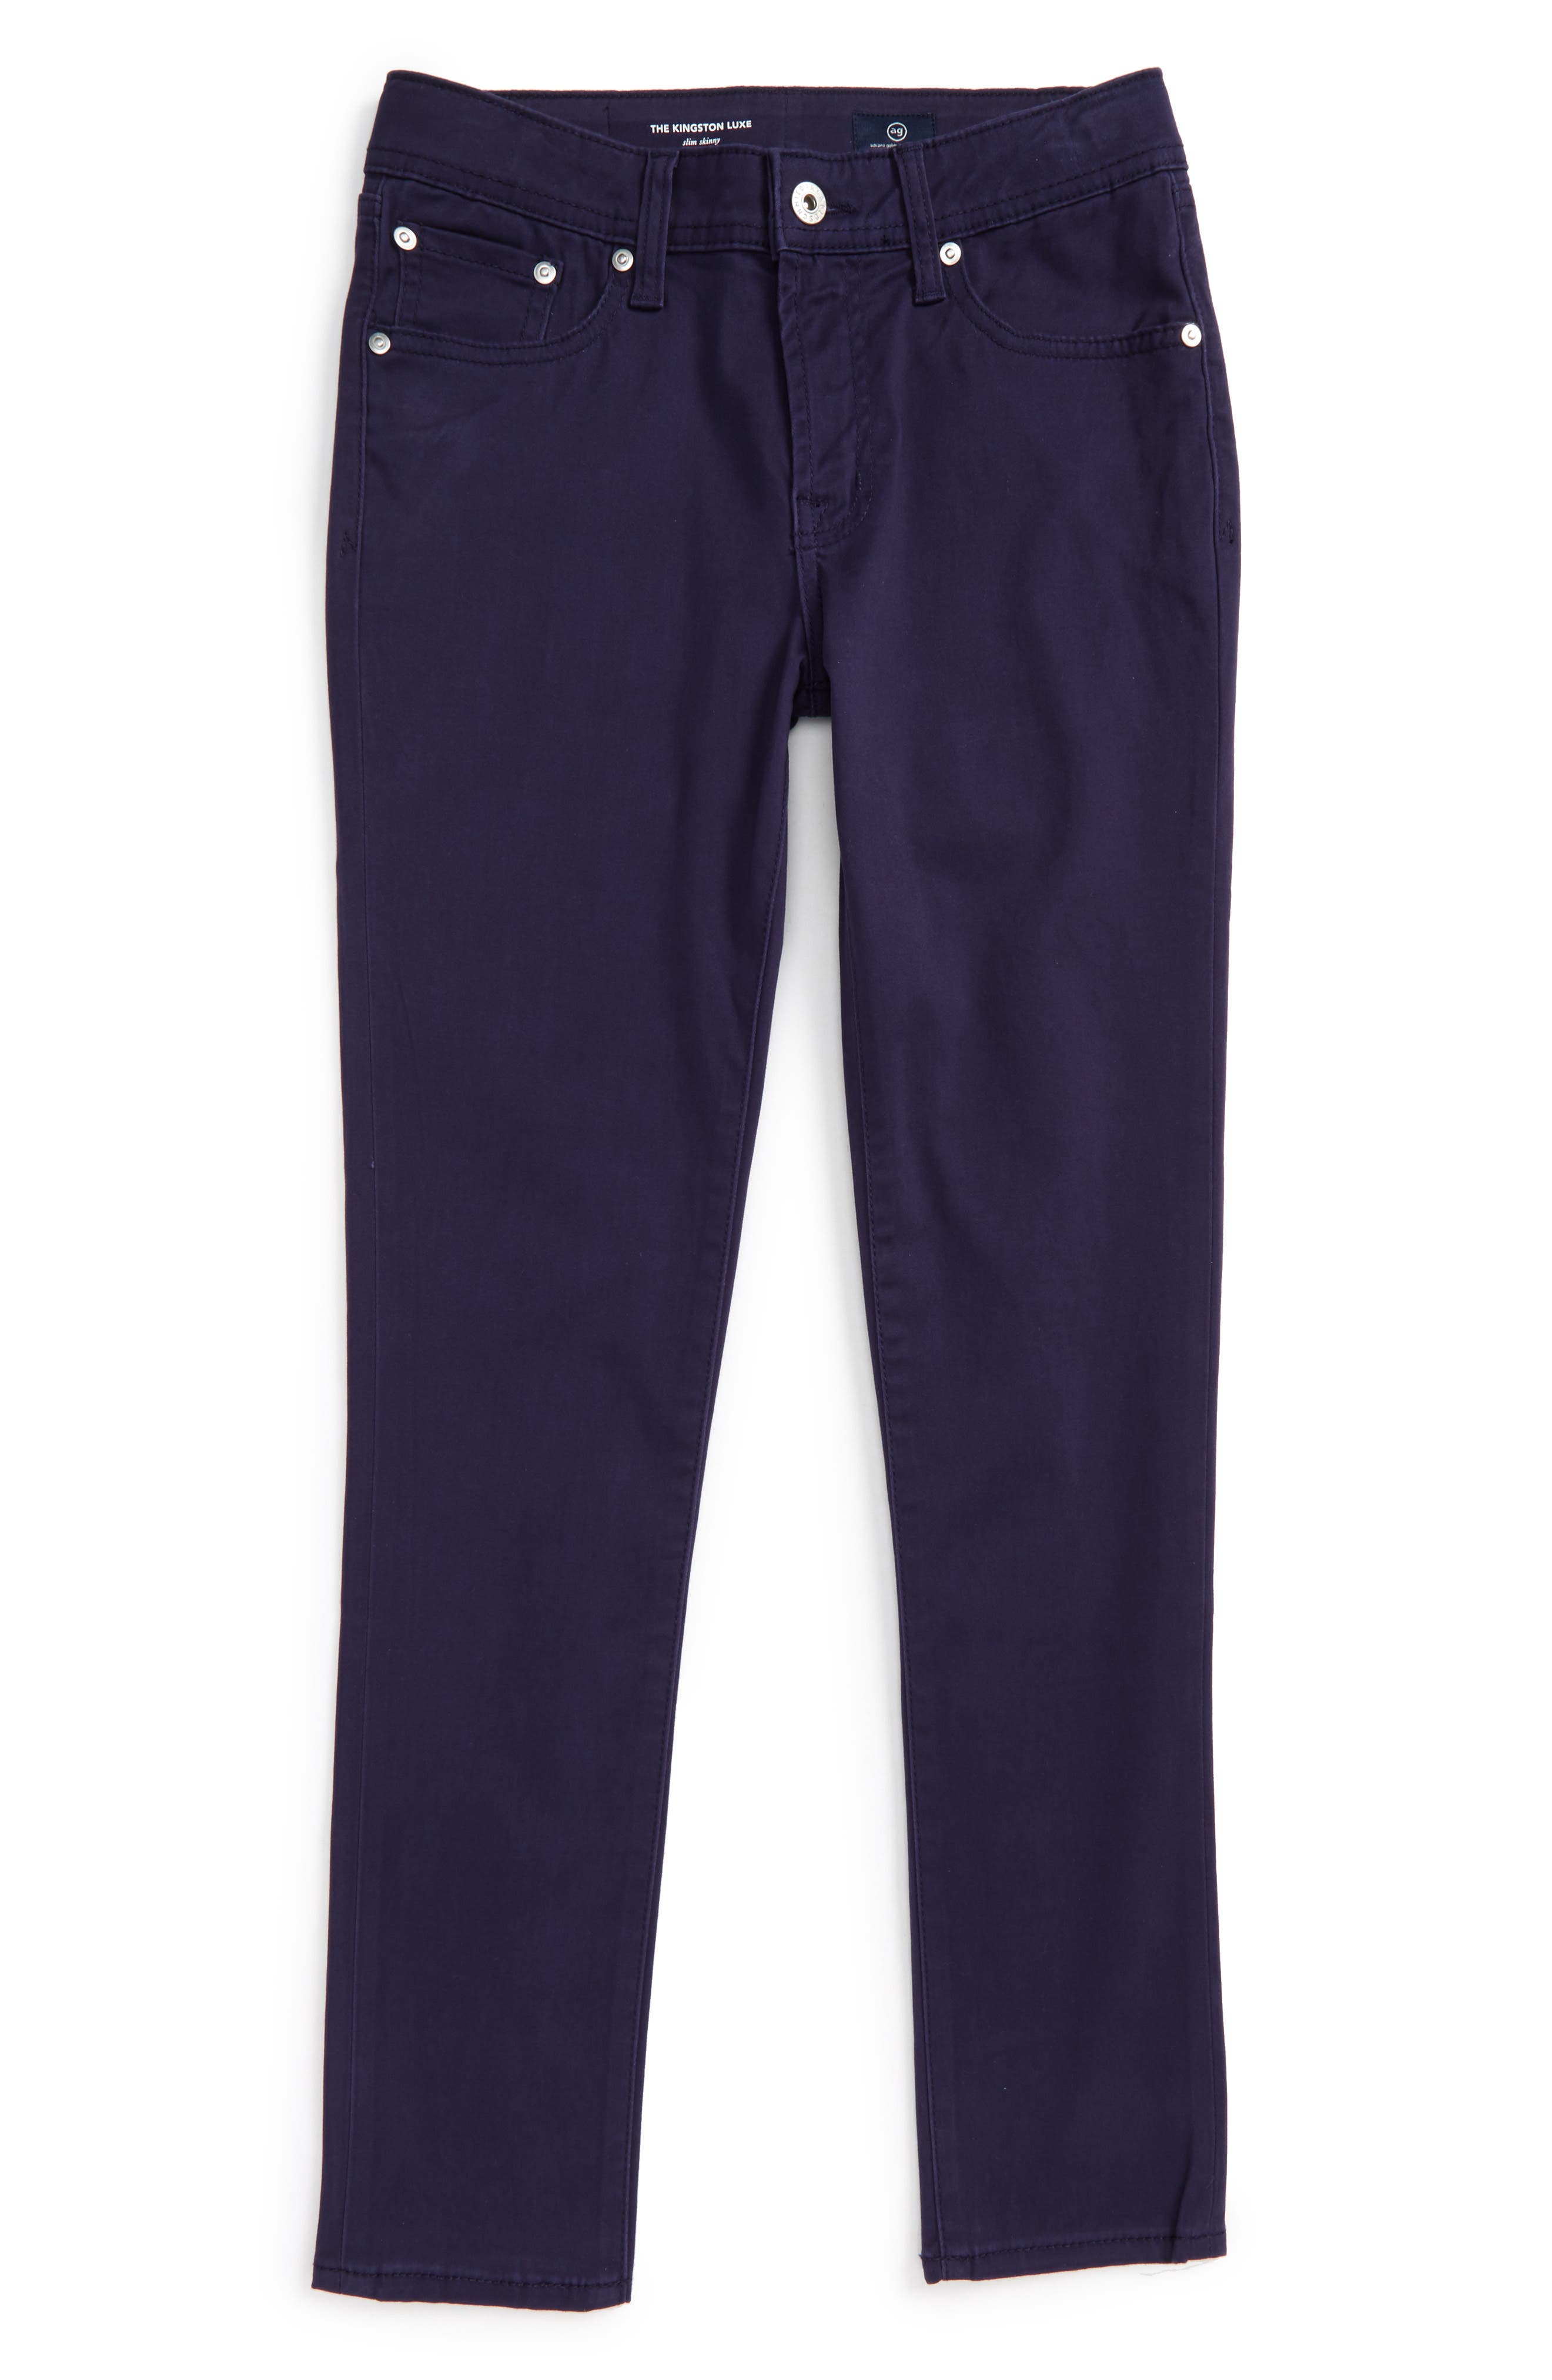 ag adriano goldschmied kids The Kingston Luxe Slim Jeans (Big Boys)